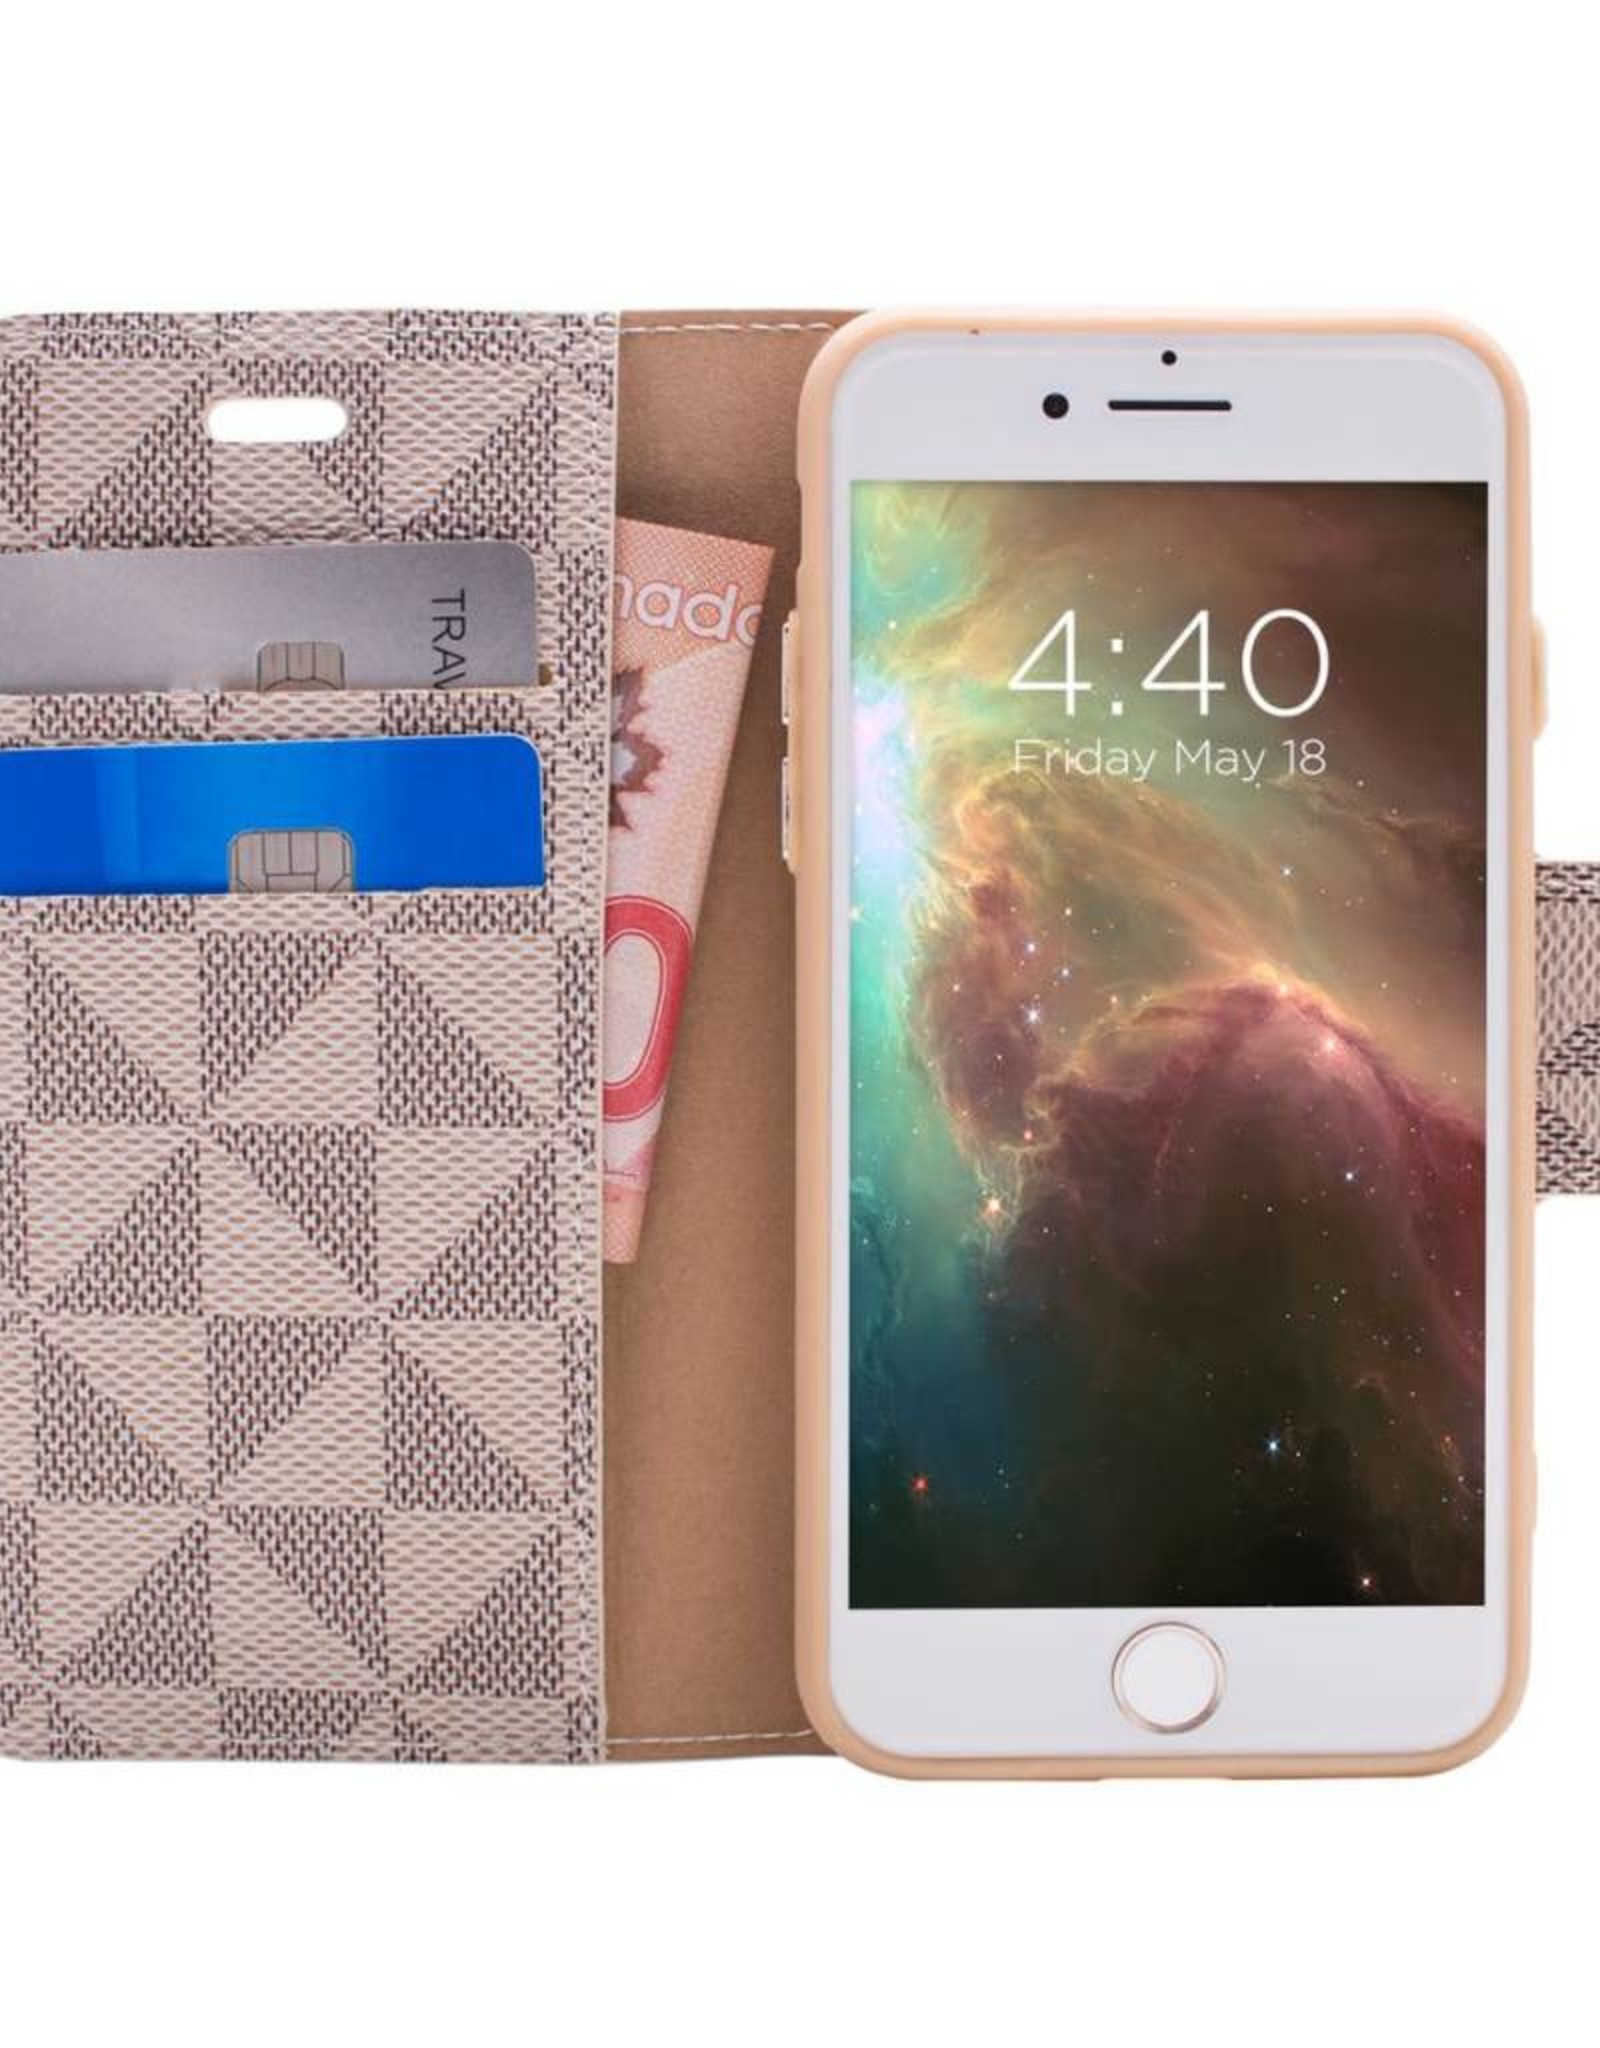 Caseco Caseco Park Ave | iPhone 8/7/6/6s+ Detachable RFID Protection Folio Case Gold | CC-PA-iP8P-GD